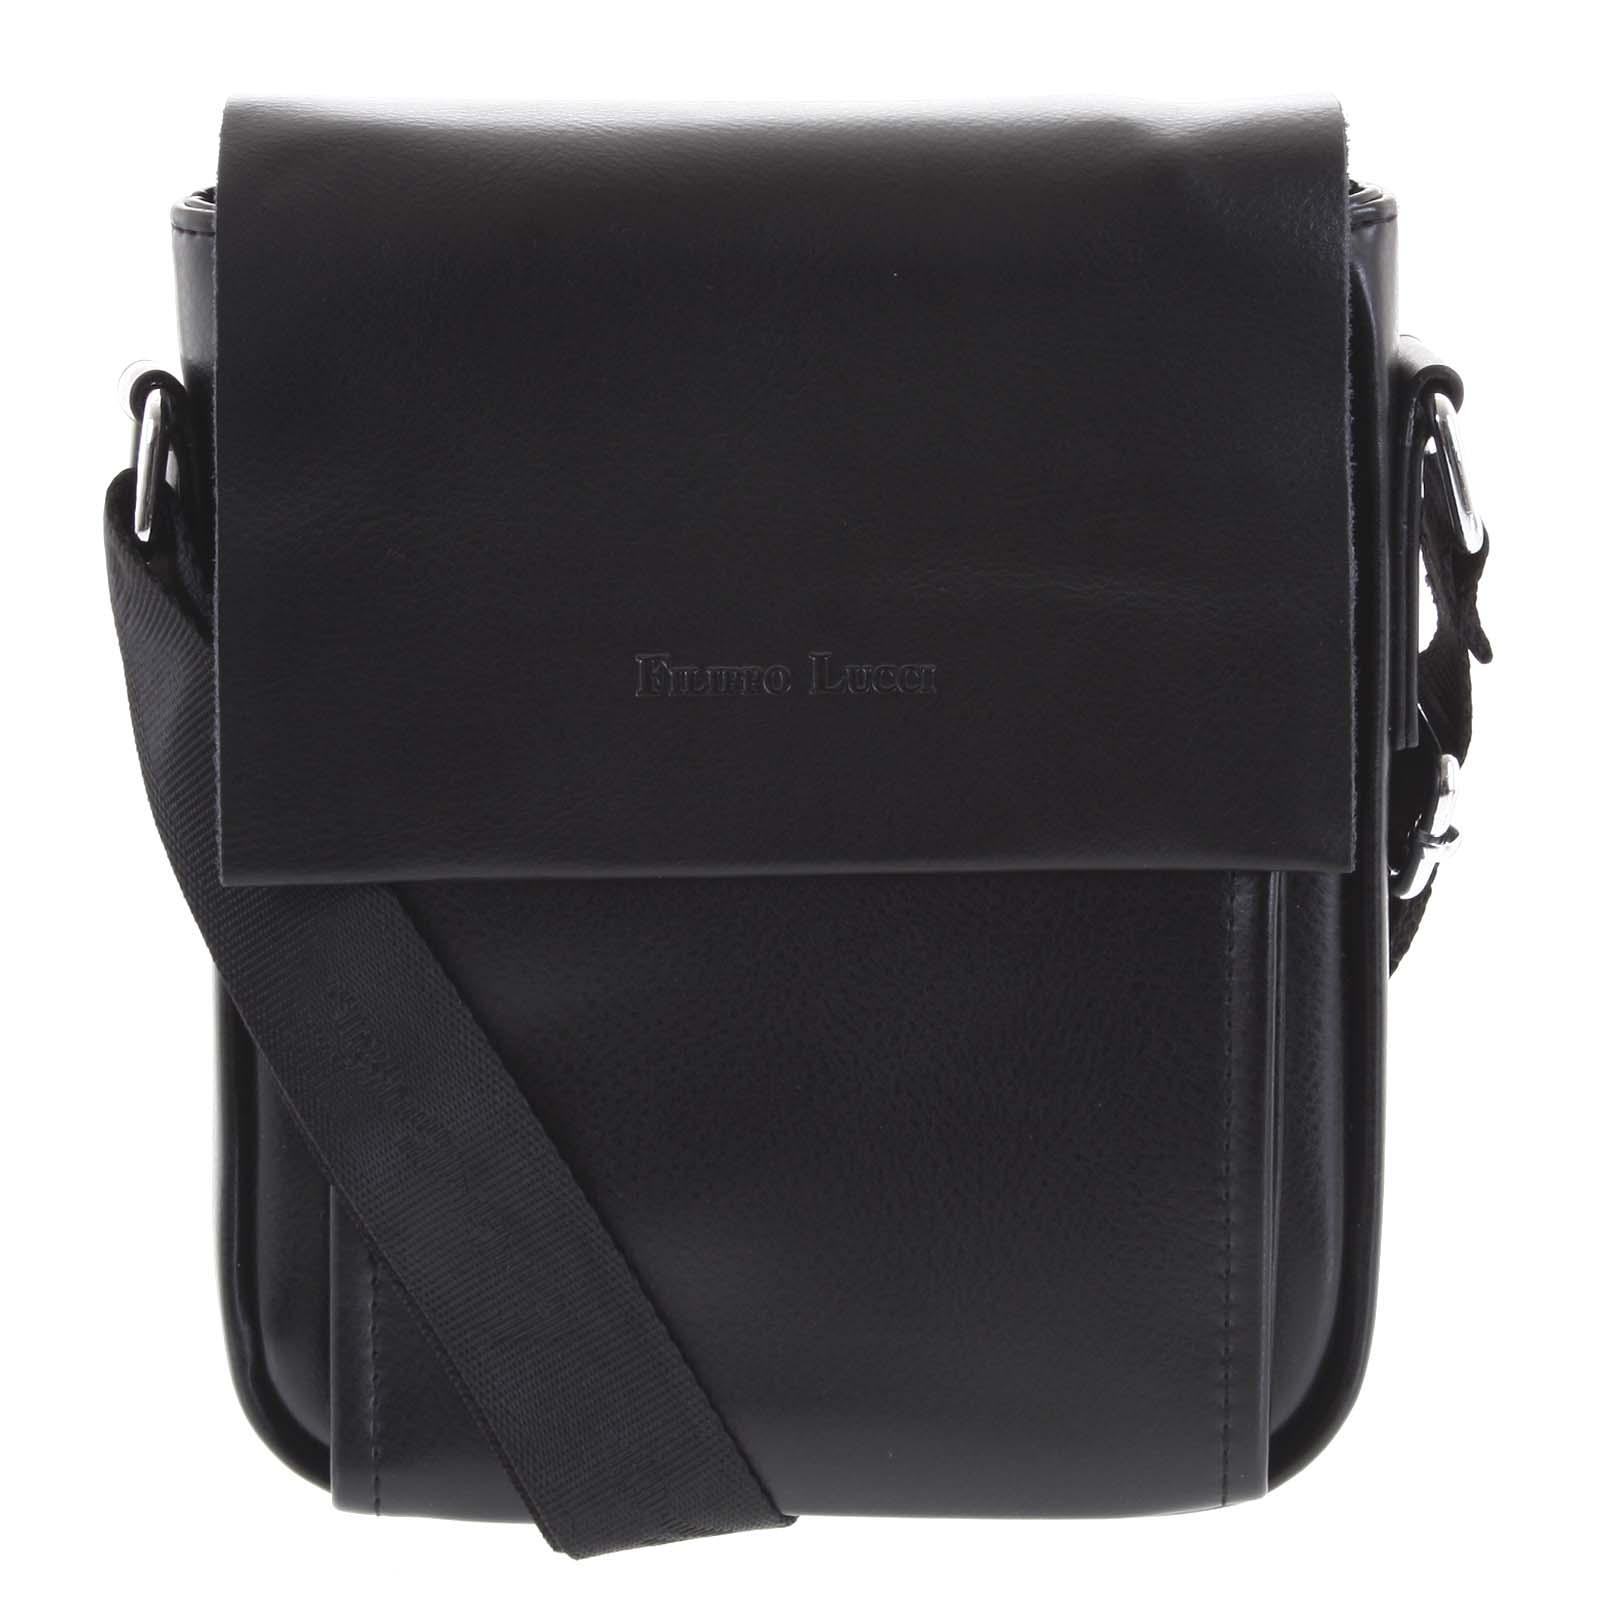 Pánská kožená crossbody taška černá - Filippo Lucci Magnett